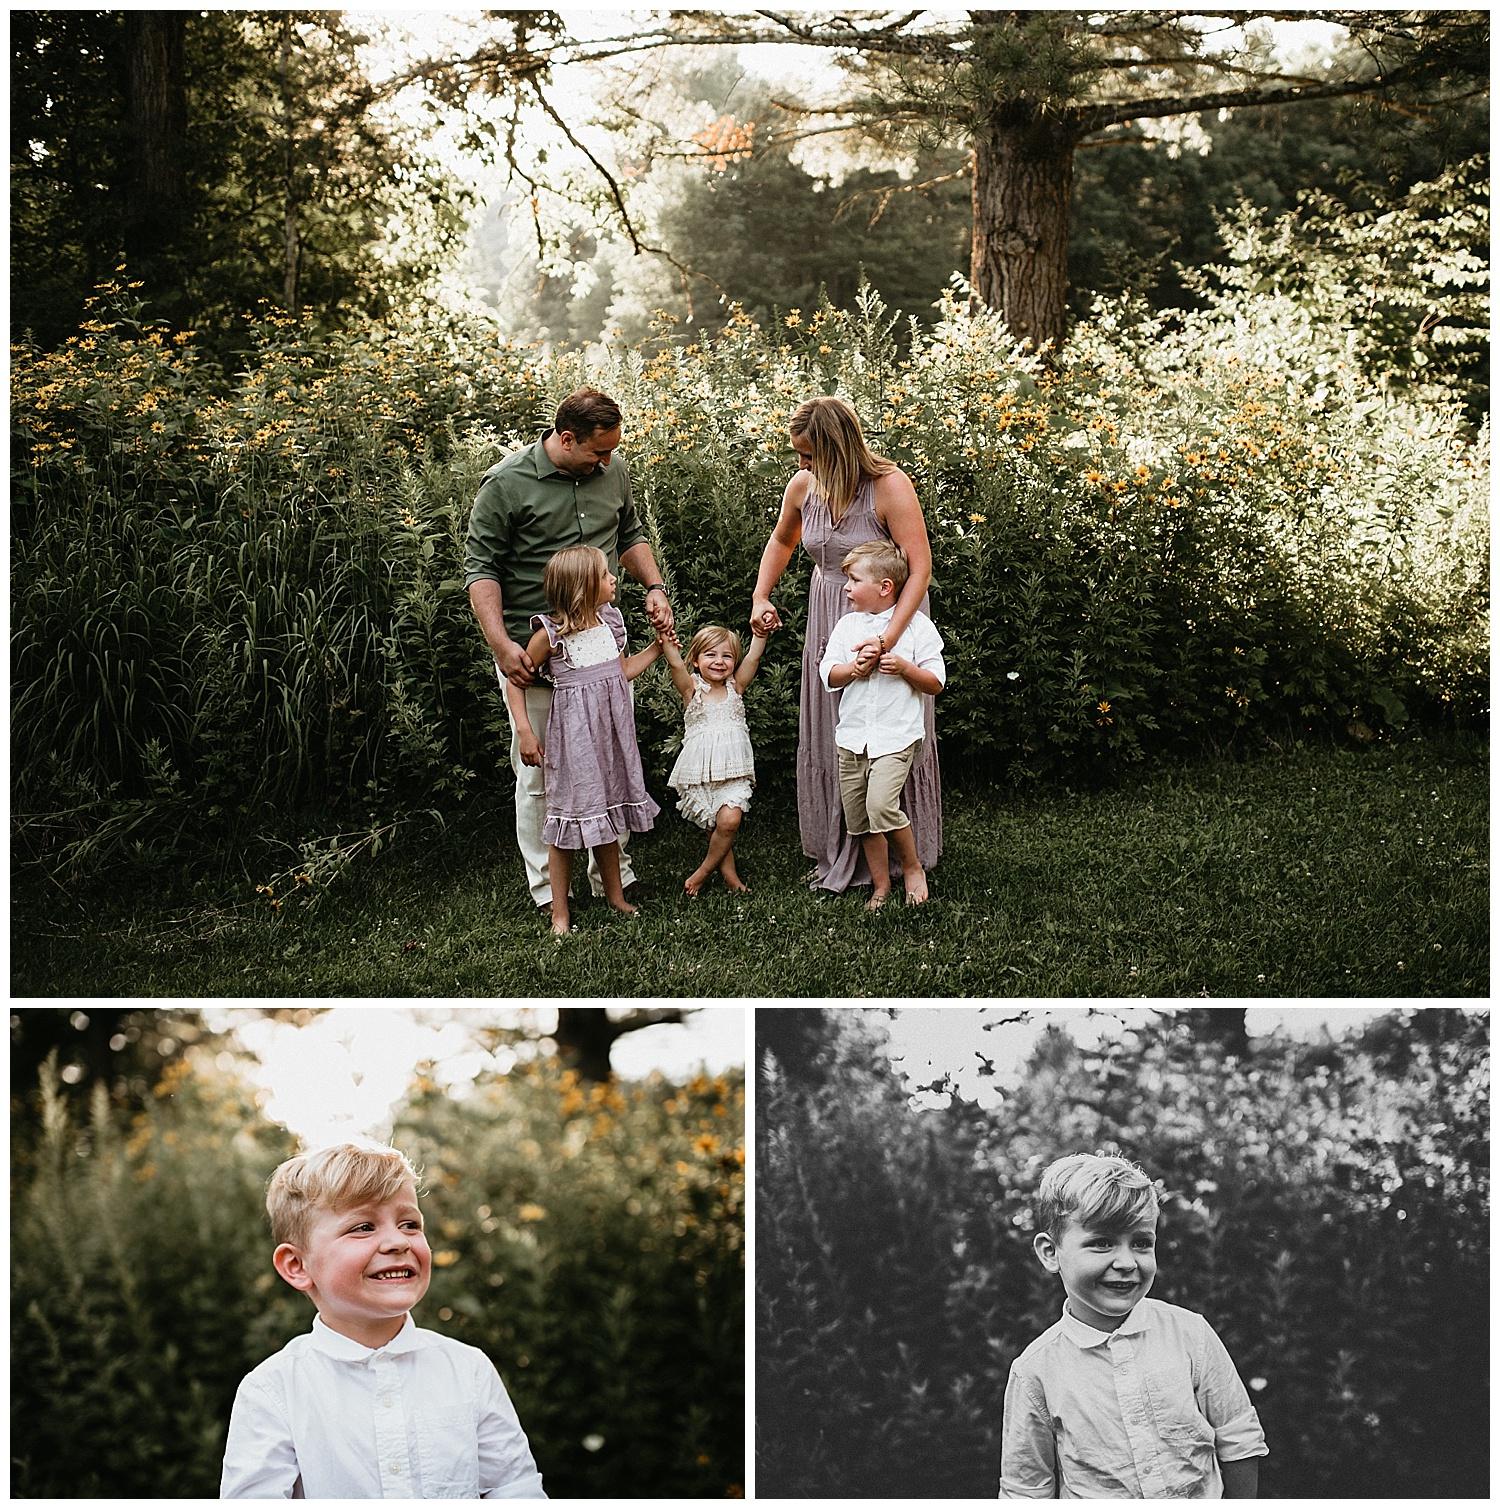 NEPA-Family-Photographer-in-Wilkes-Barre-PA_0160.jpg